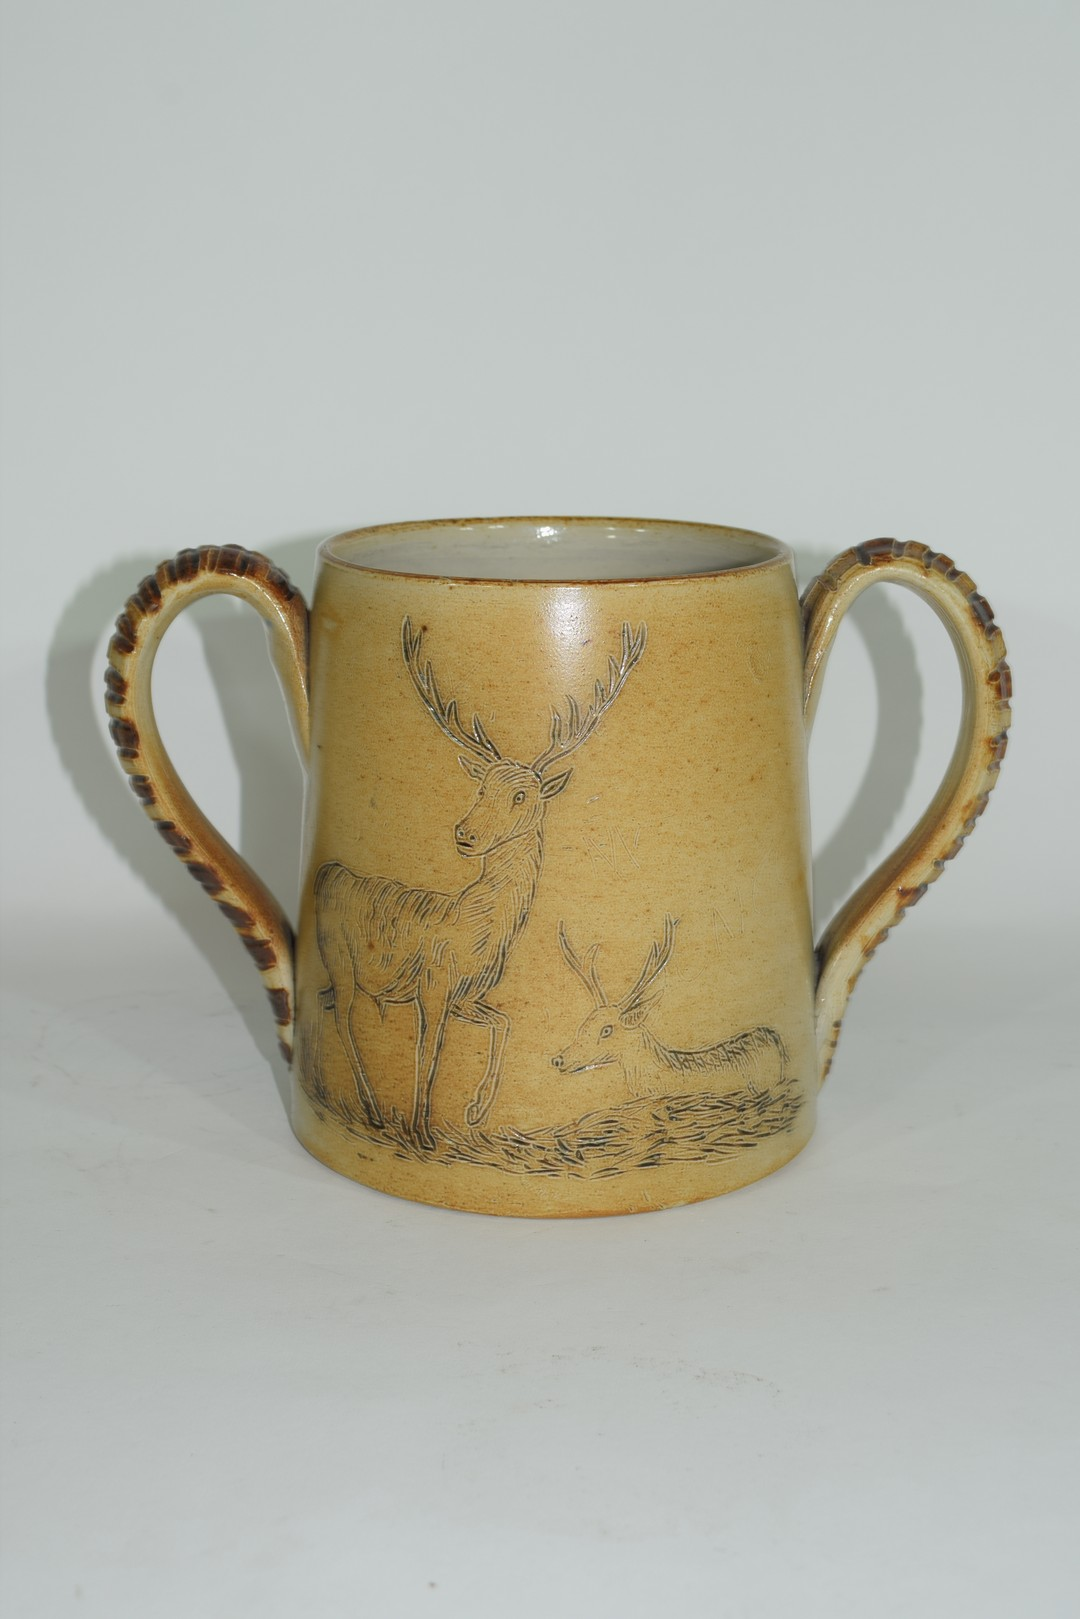 Smith & Co salt glazed two handled mug or tyg